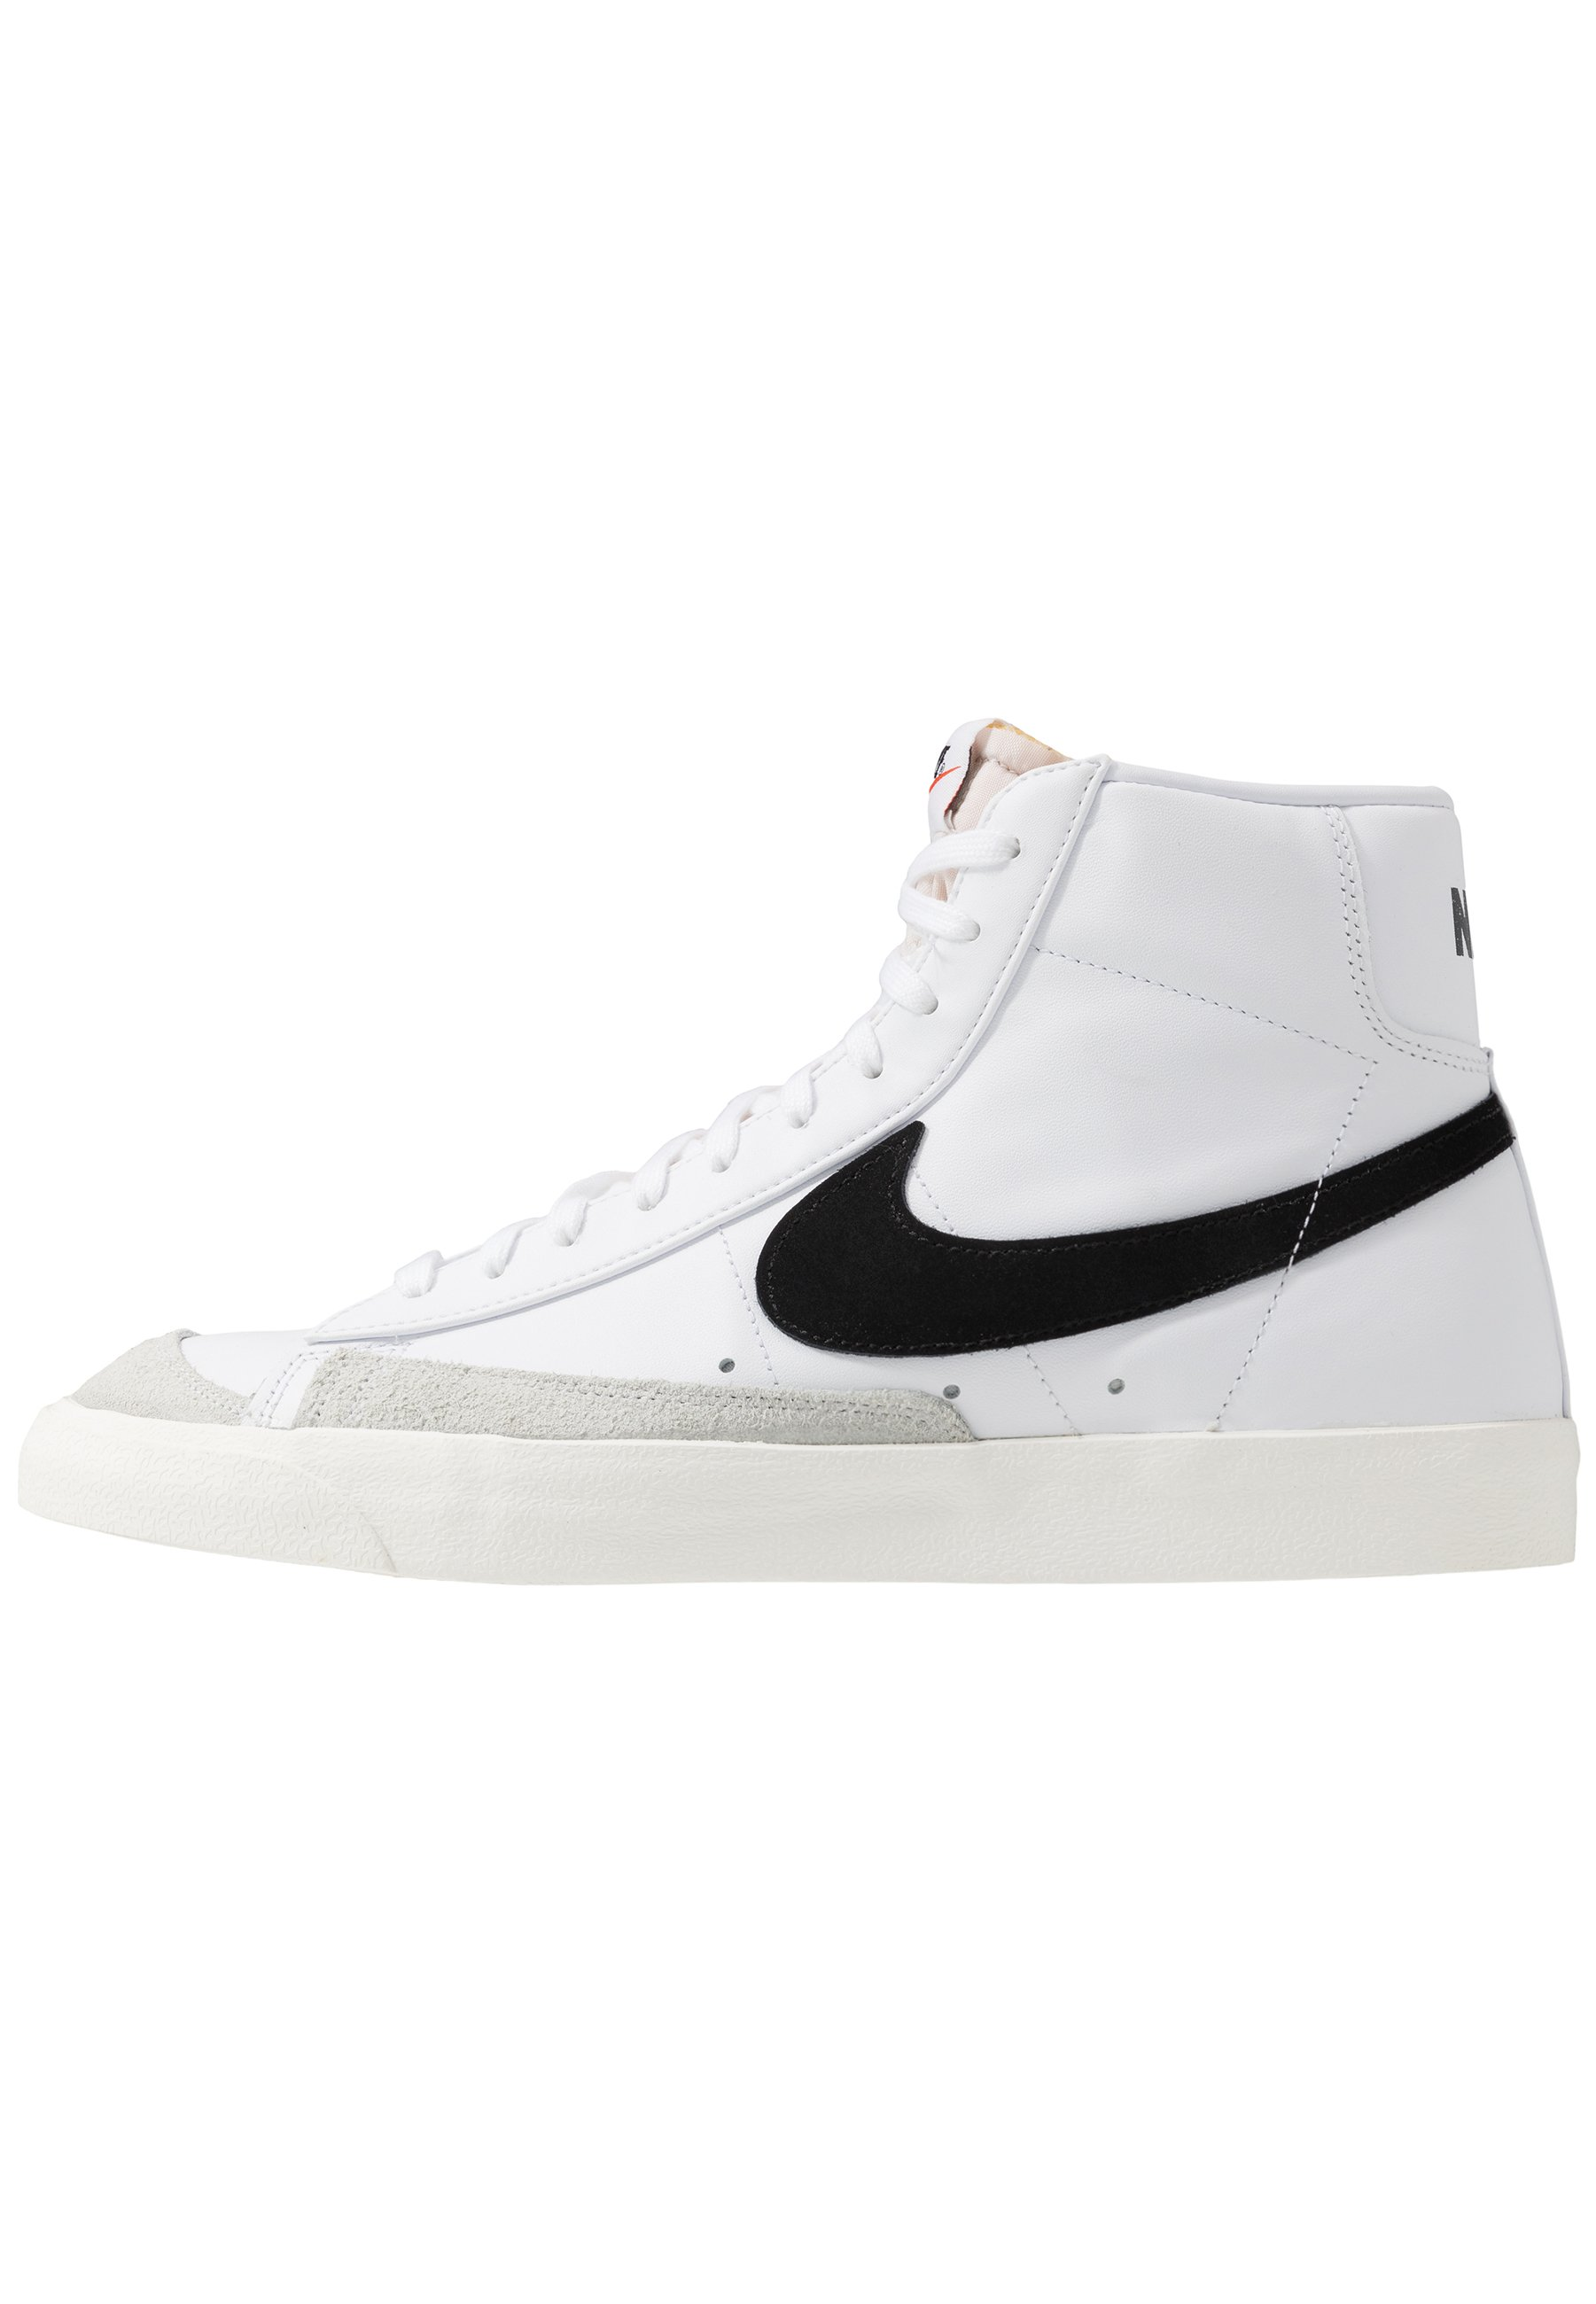 BLAZER MID '77 Sneakers hoog whiteblack